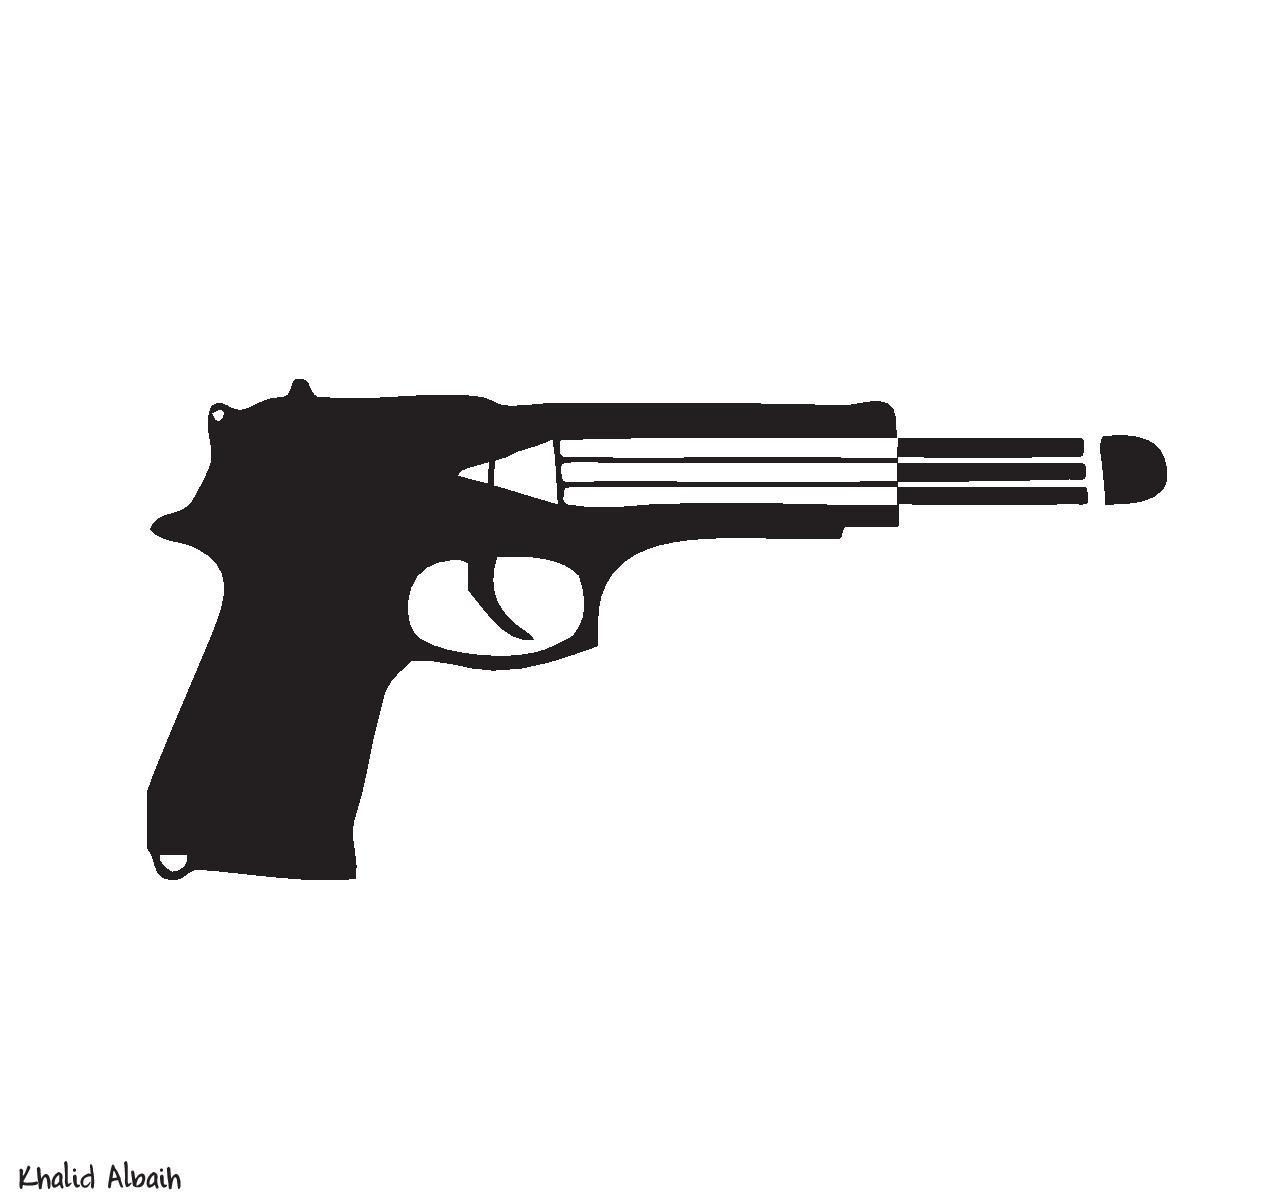 L'art de la satire de Khalid Albaih – The art of satire by Khalid Albaih